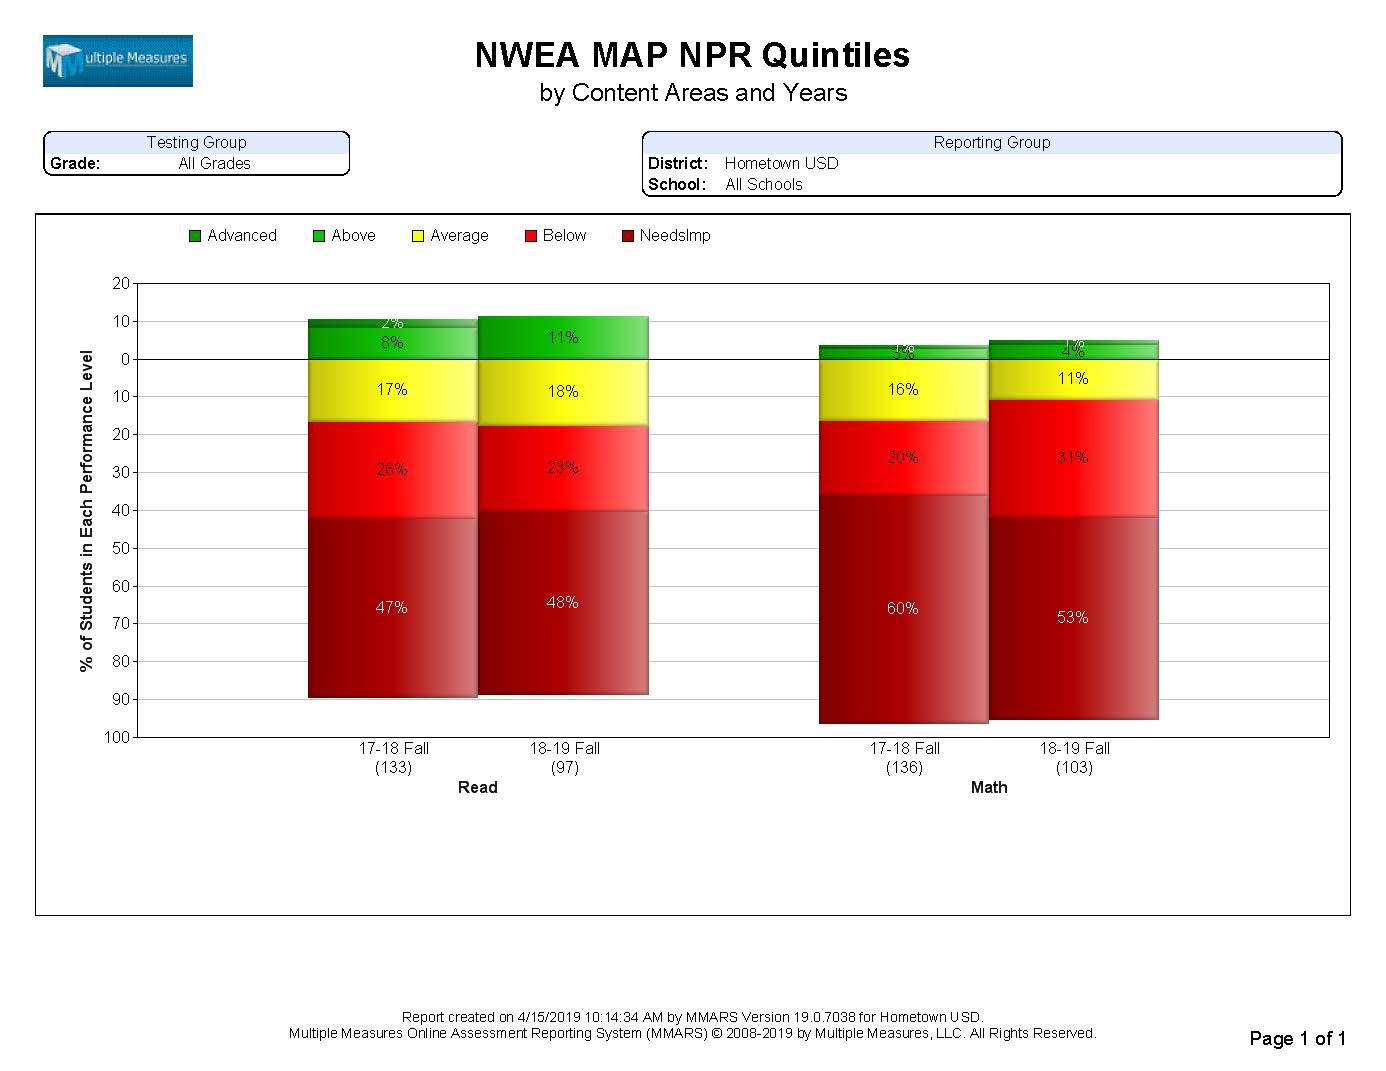 NWEA-Summary_NPRQuintiles_CATALOG.jpg